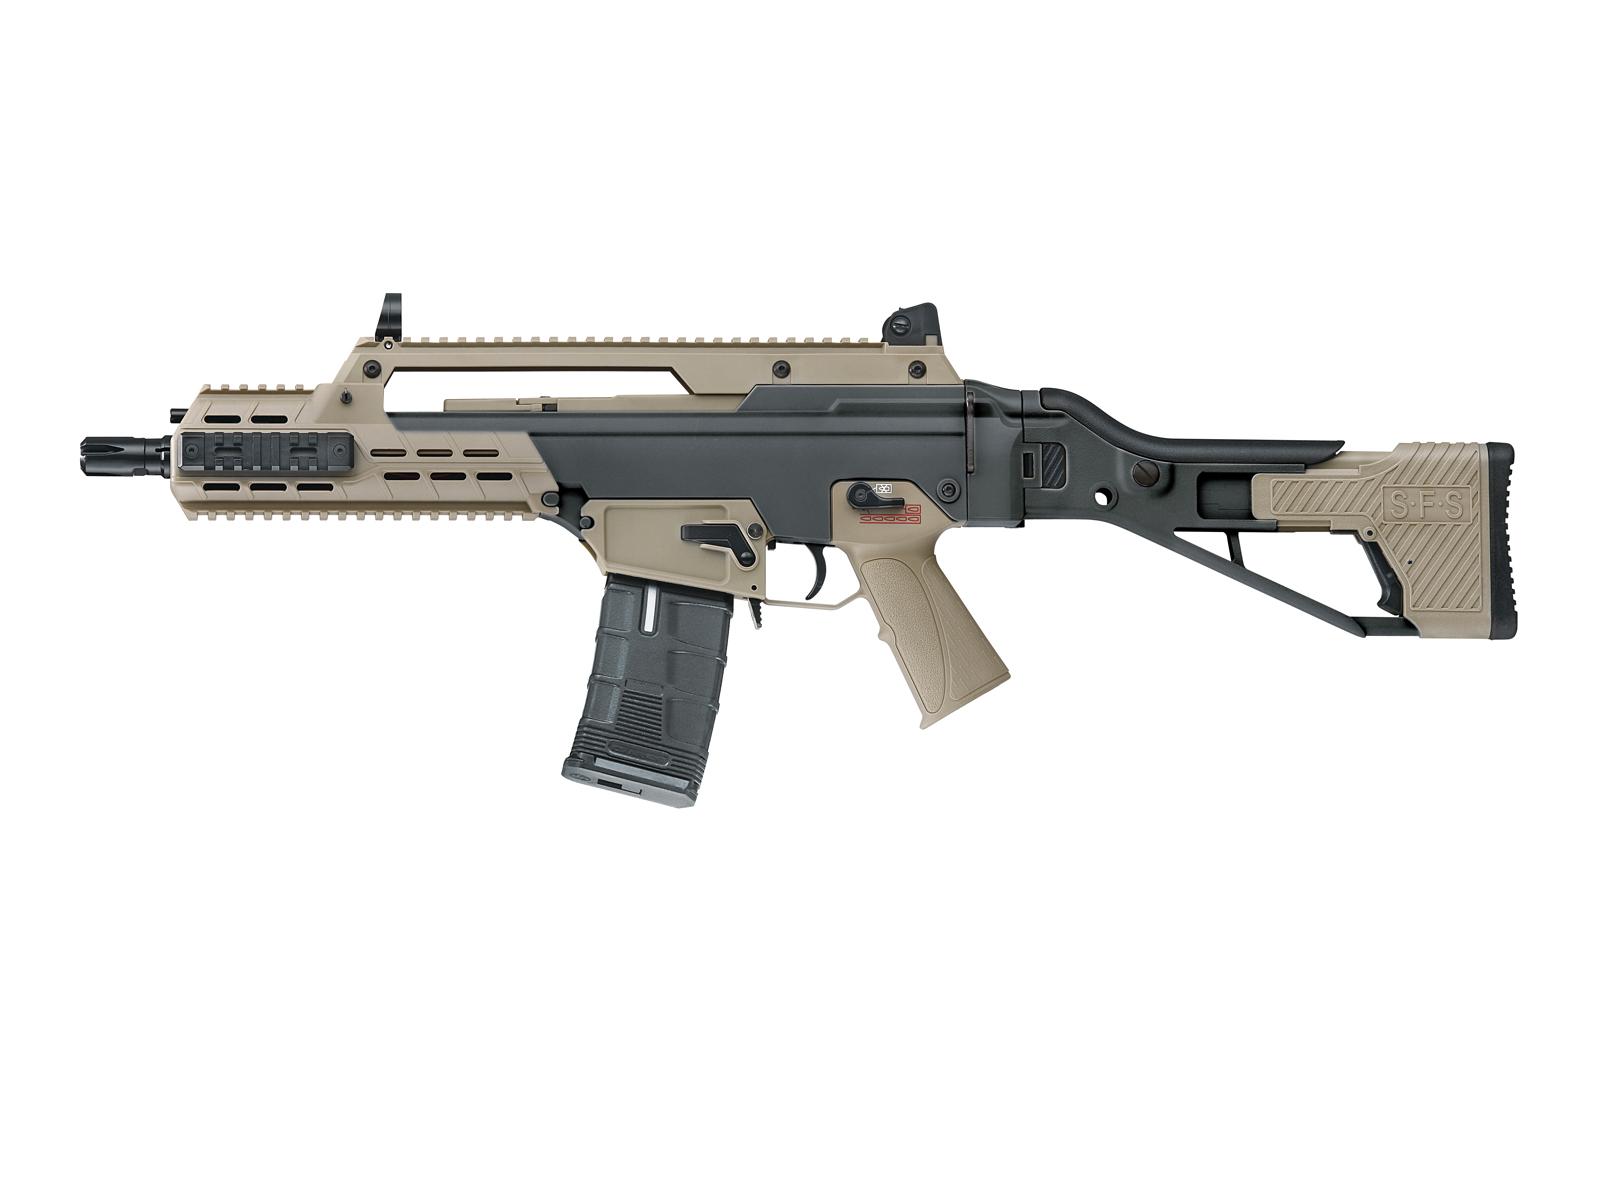 ICS AAR Compact Assault, DT – M95 product image